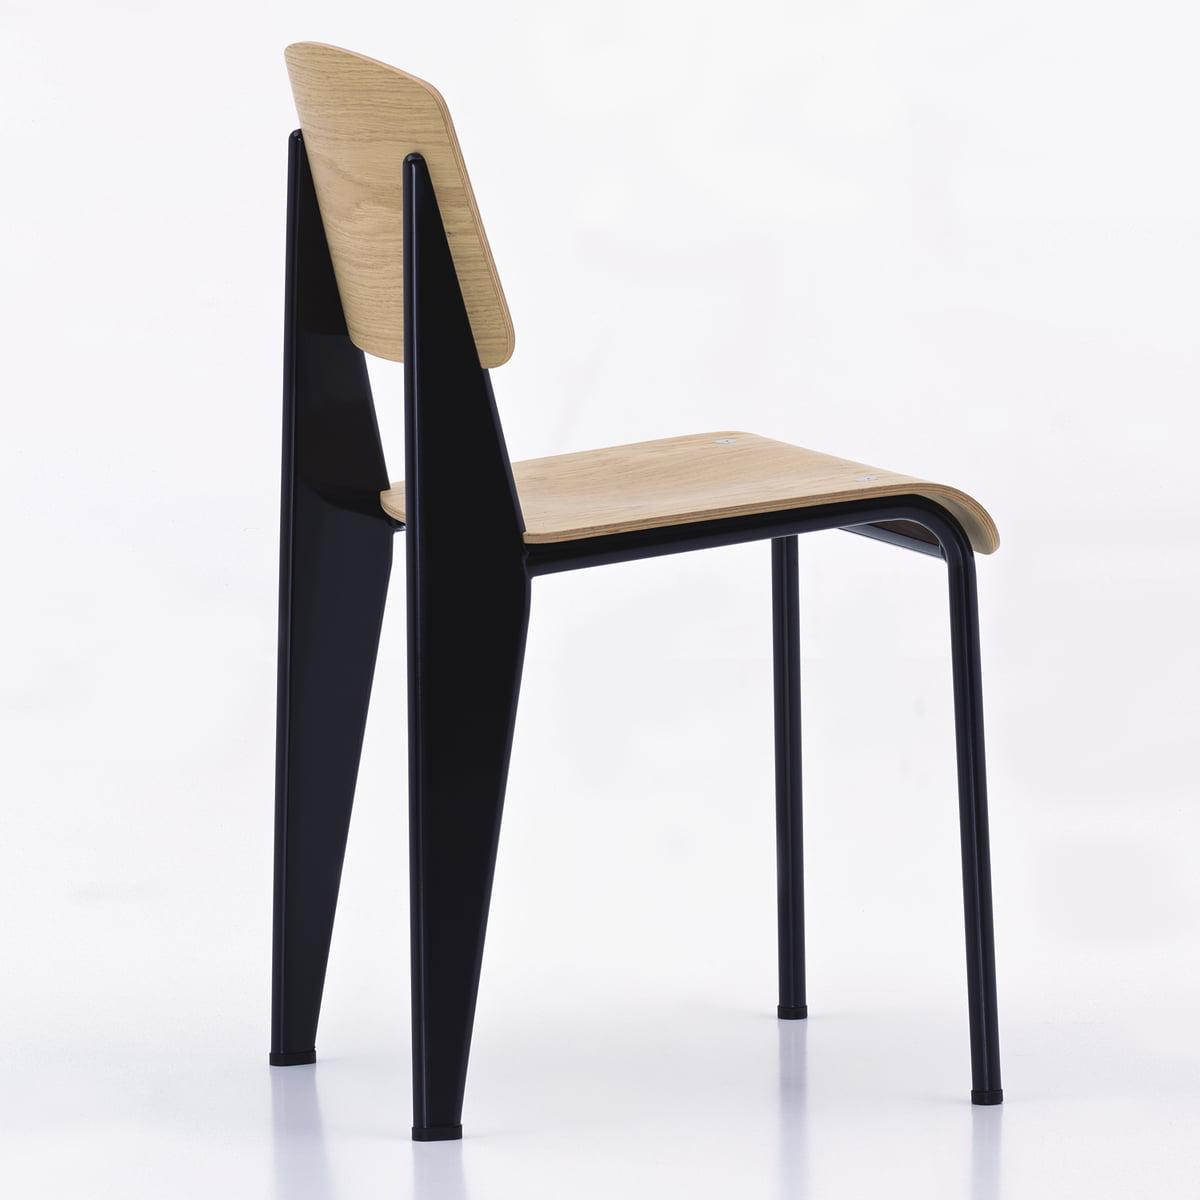 Vitra   Standard Stuhl, Eiche Hell, Schwarz   Rückseite